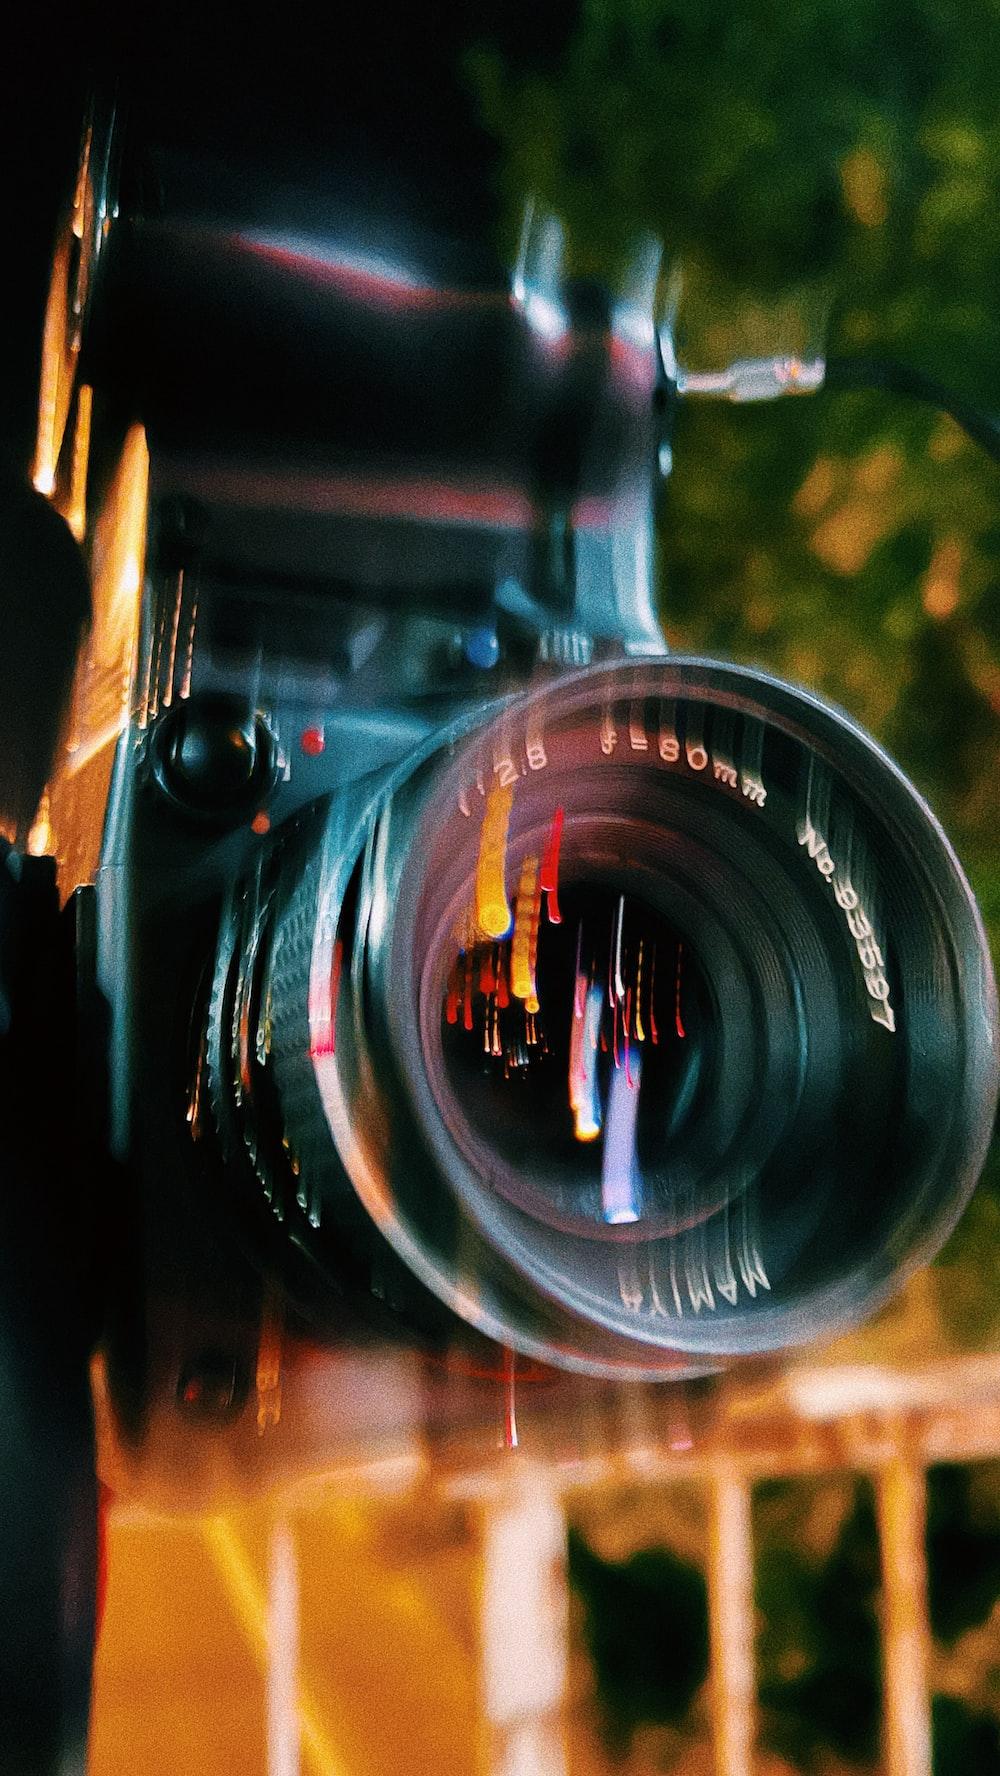 black nikon camera lens in close up photography